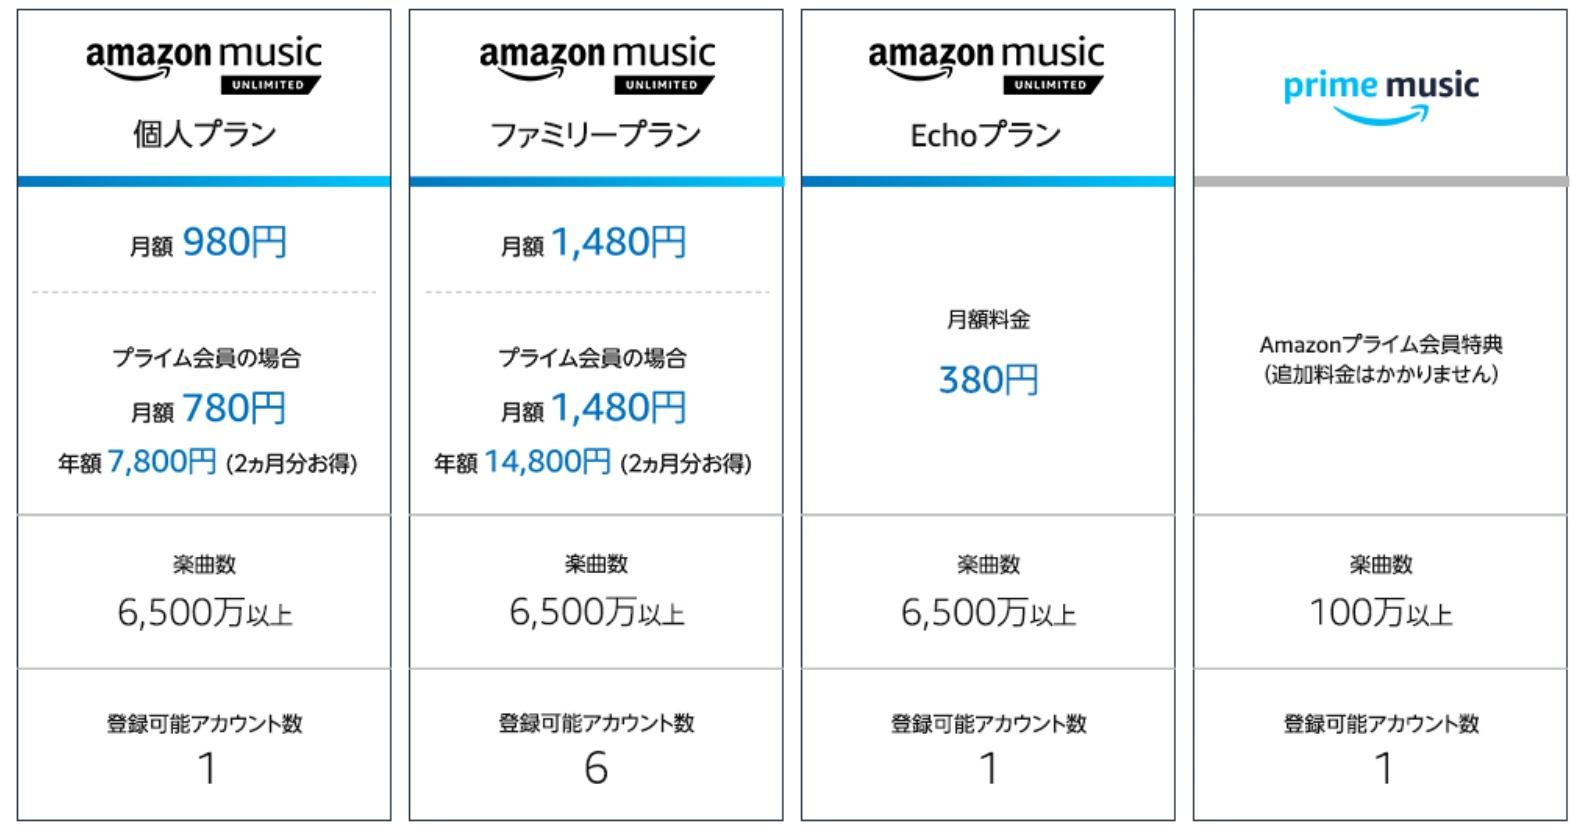 Amazon music 料金比較表